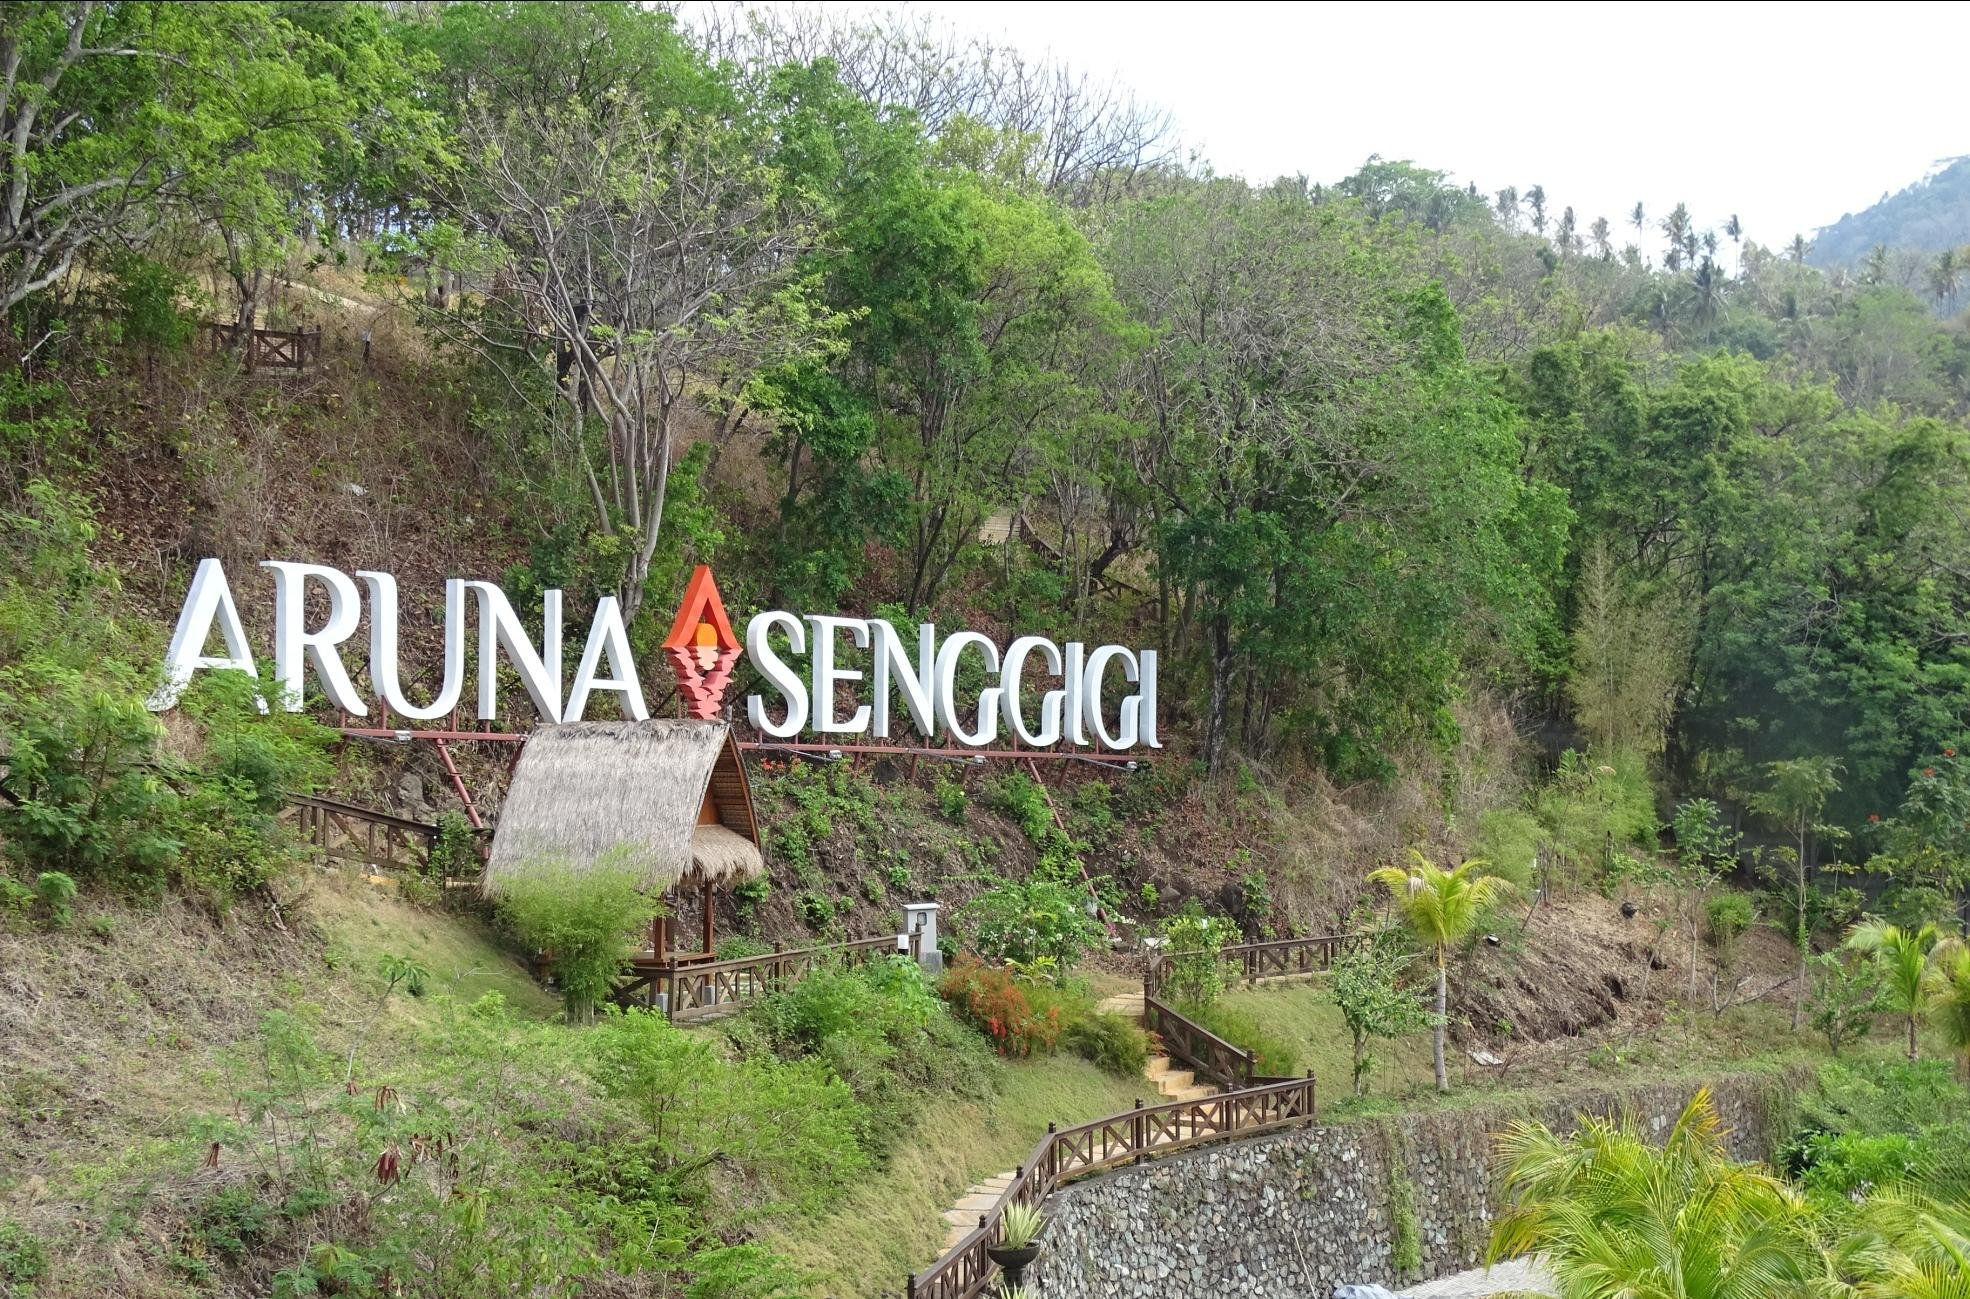 Aruna Senggigi